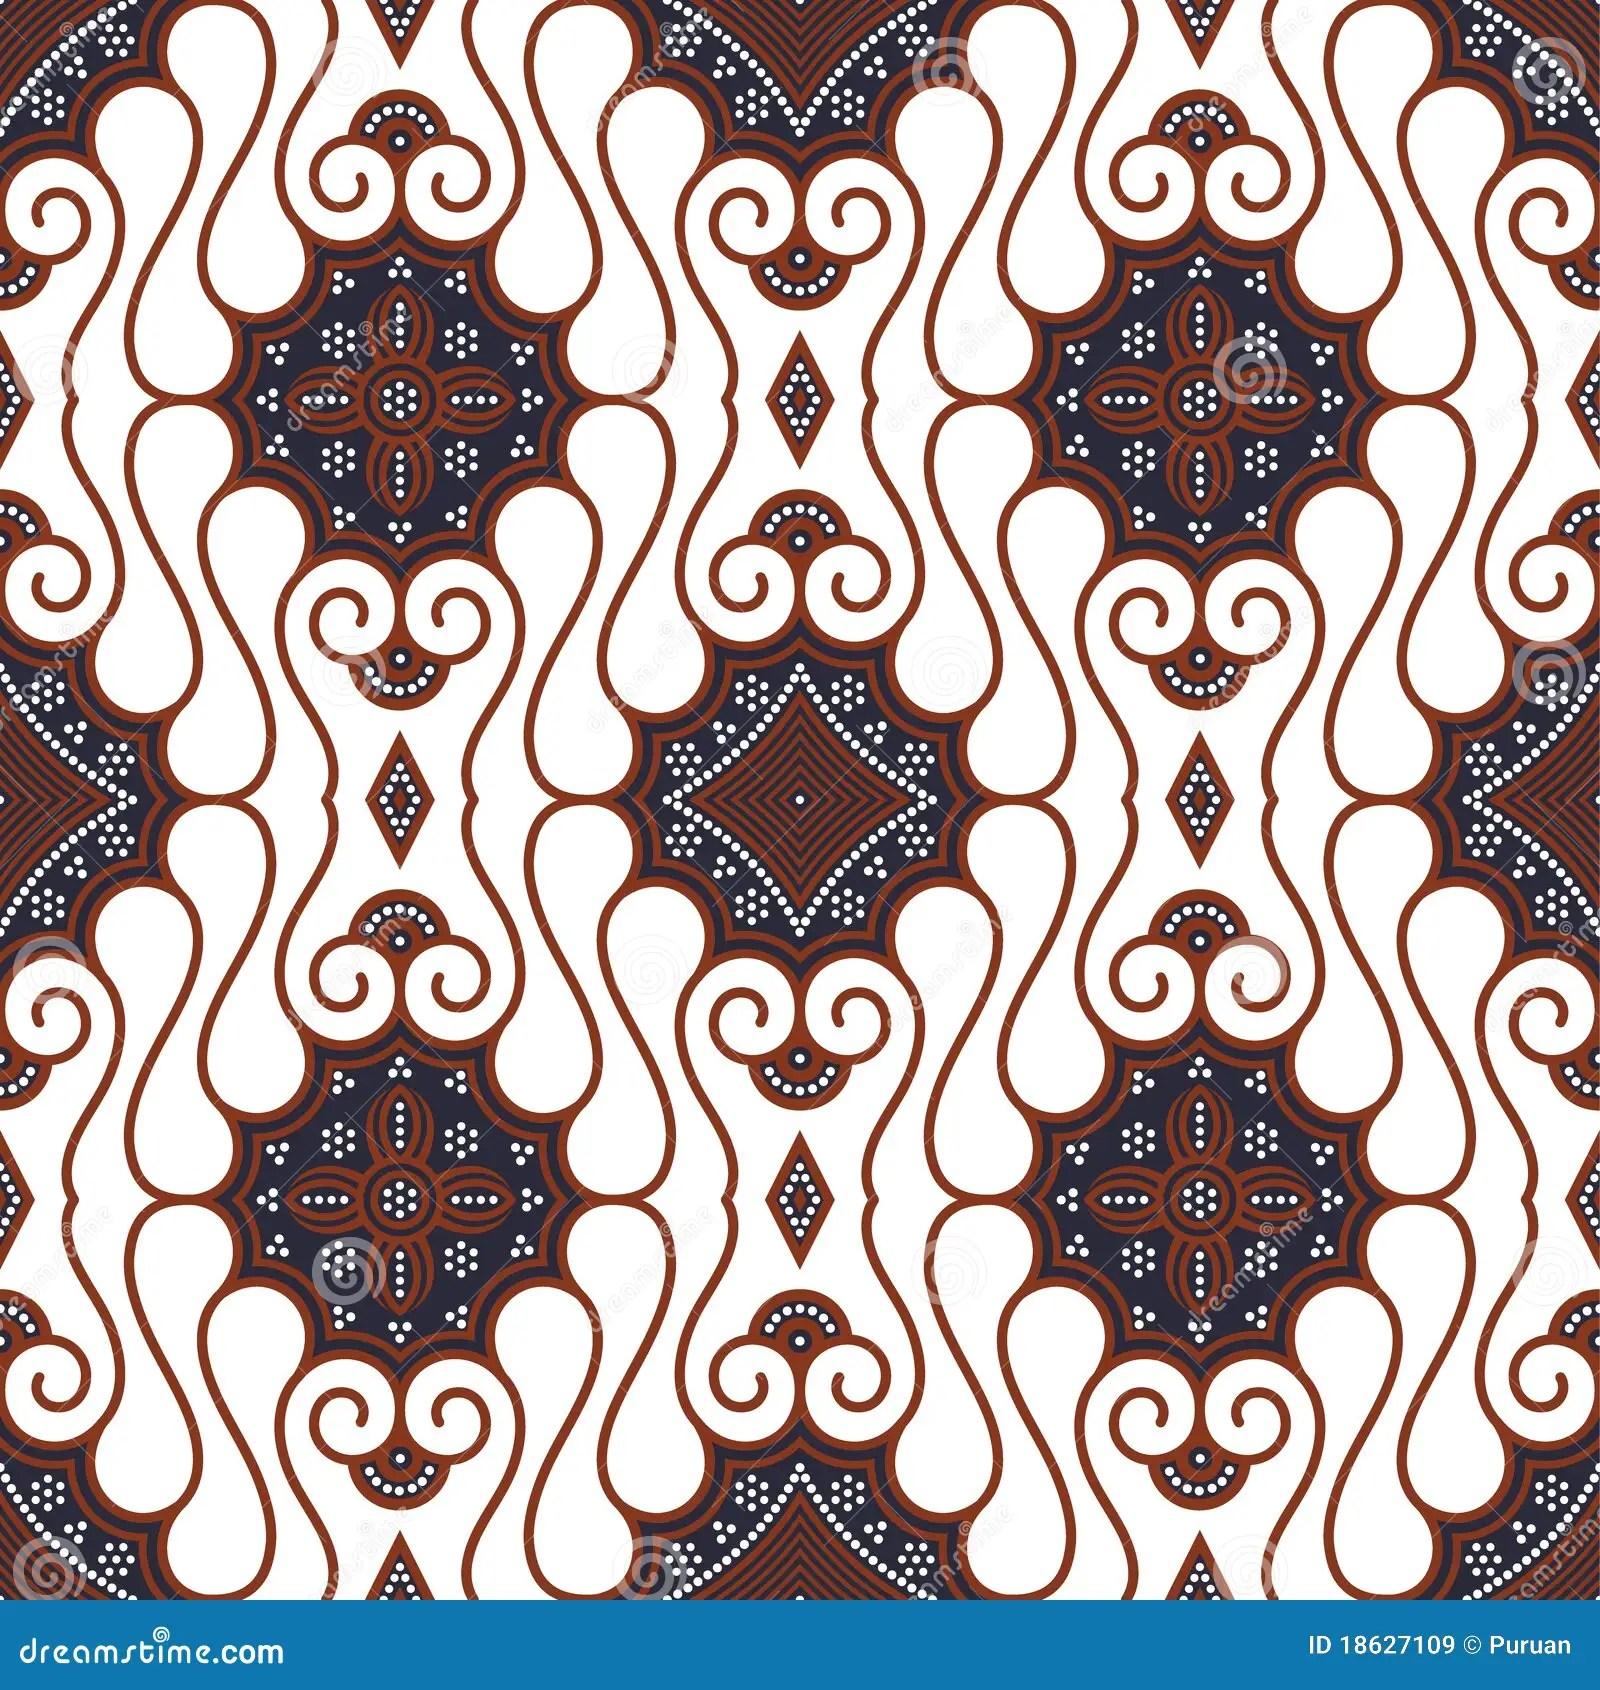 Cheap Black And White Wallpaper Seamless Brown White Batik Background Royalty Free Stock